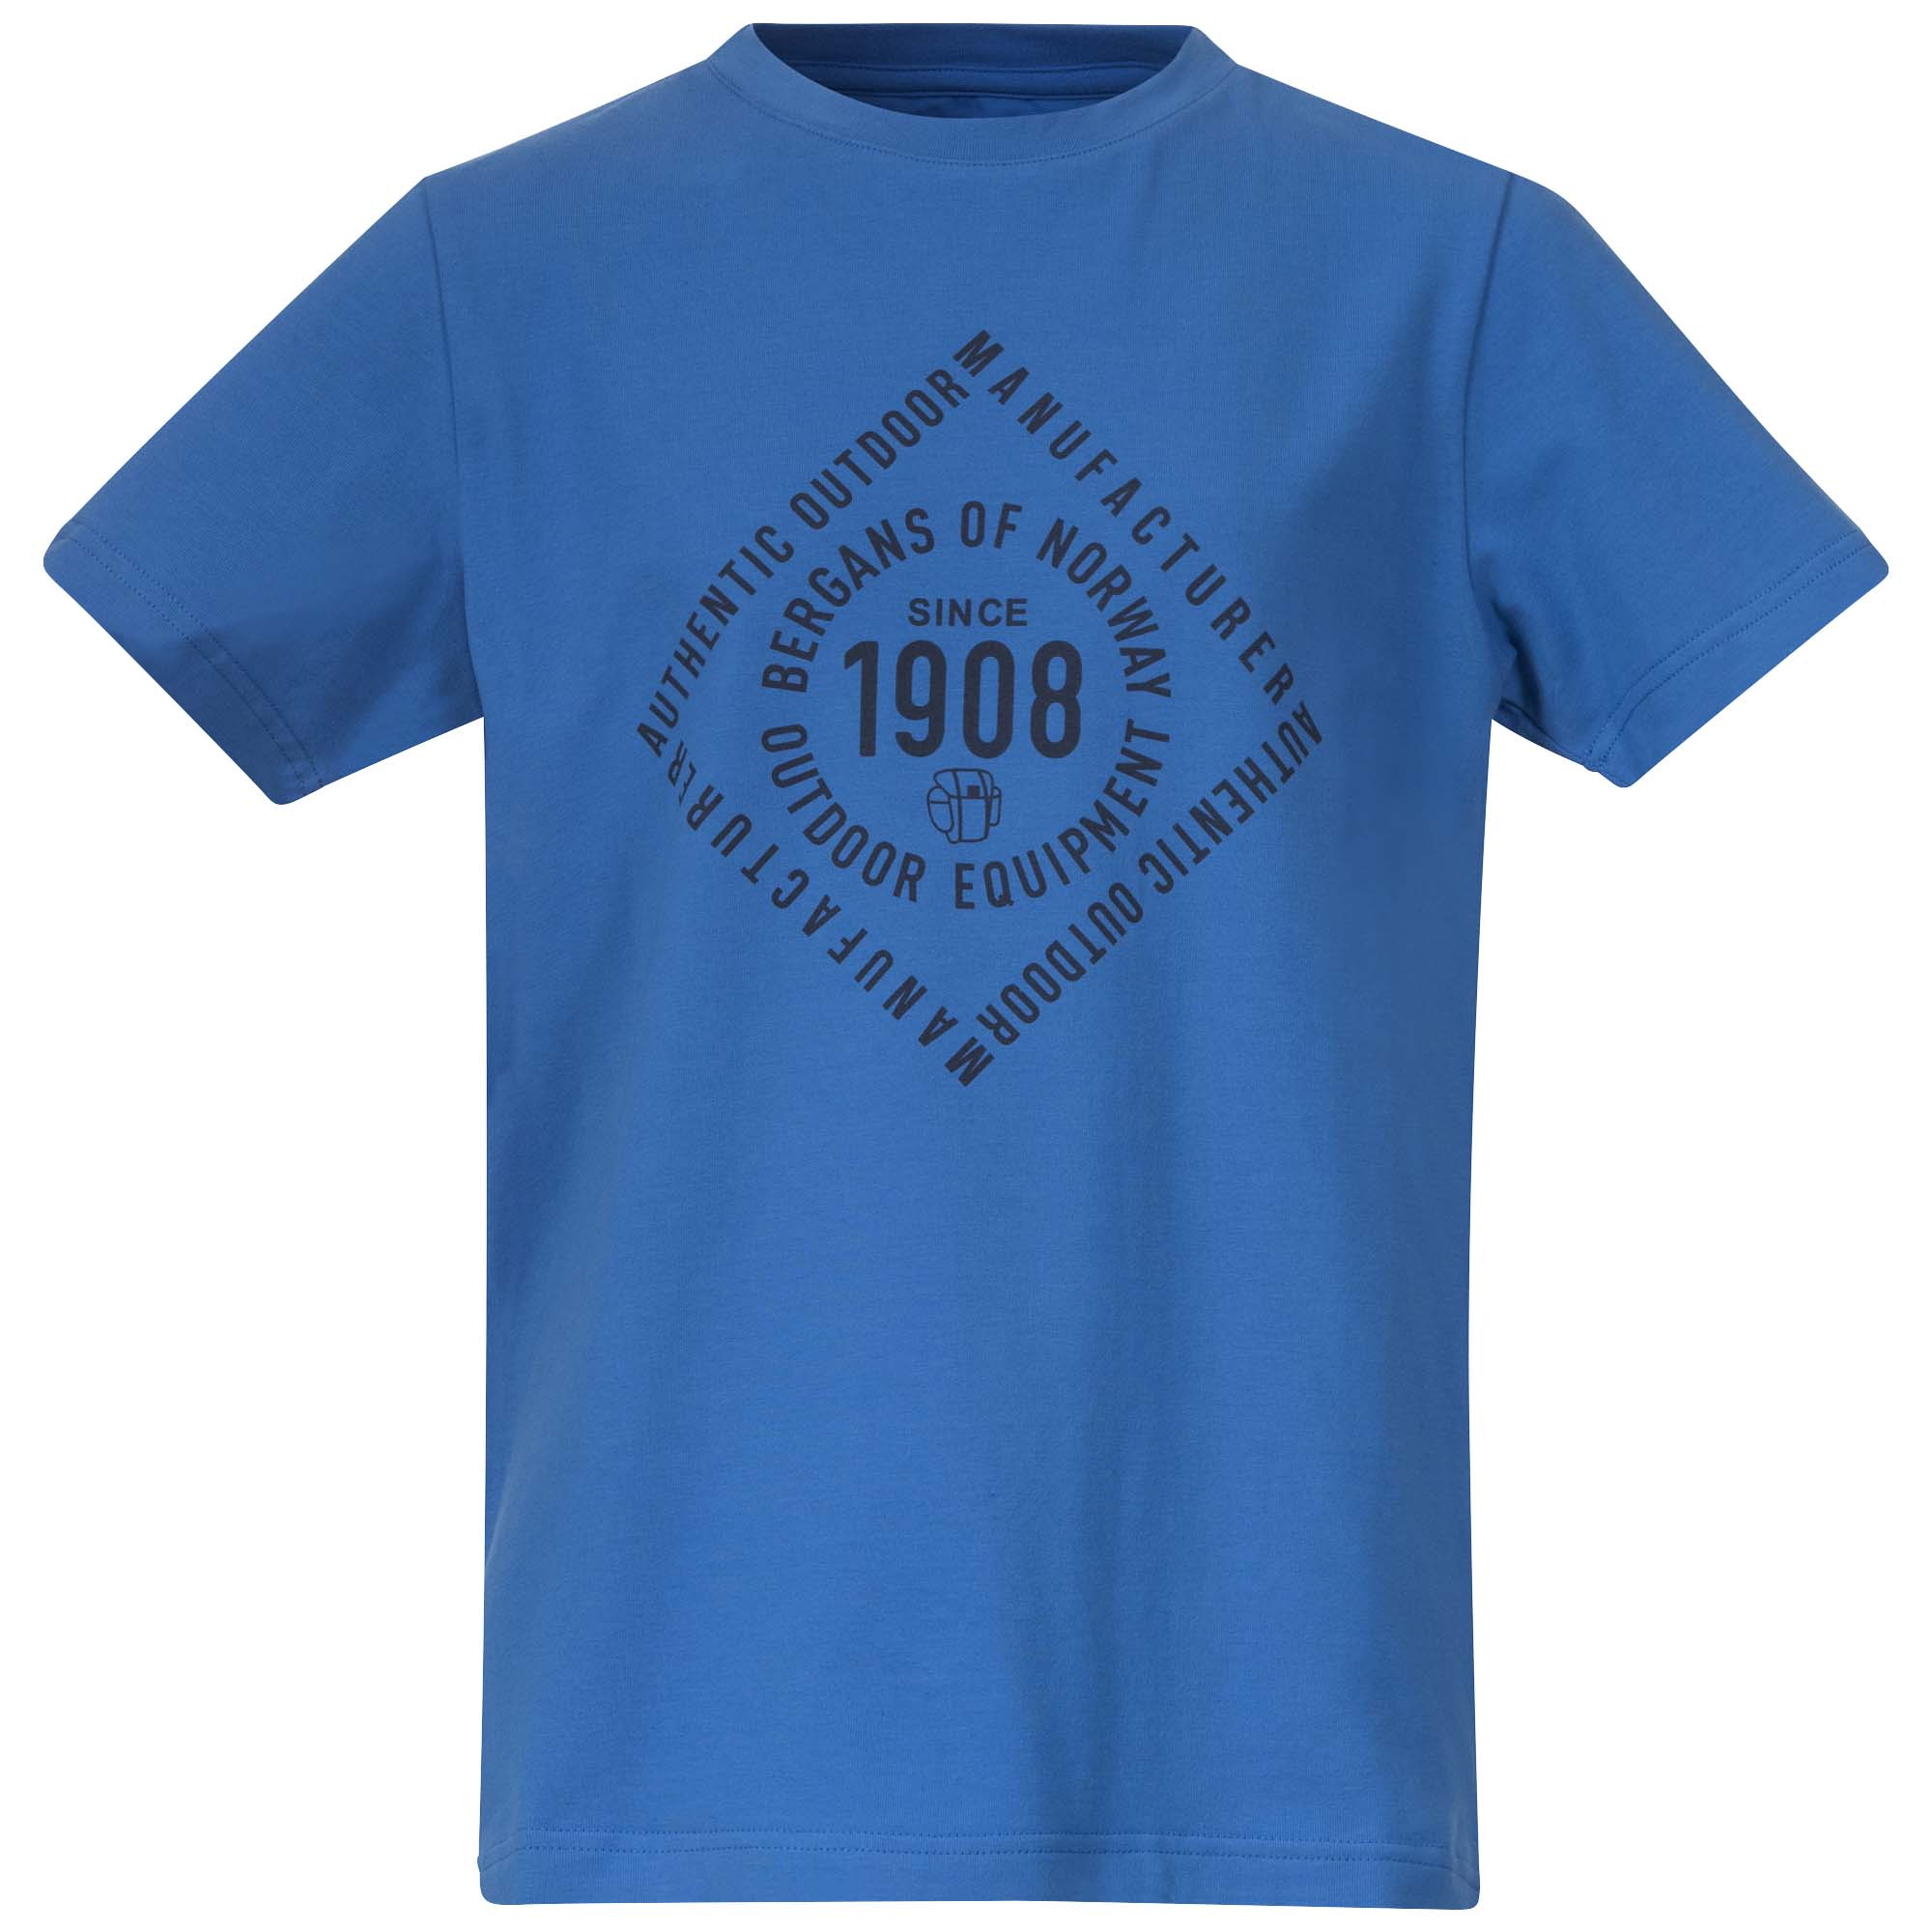 Bergans 1908 Youth Tee